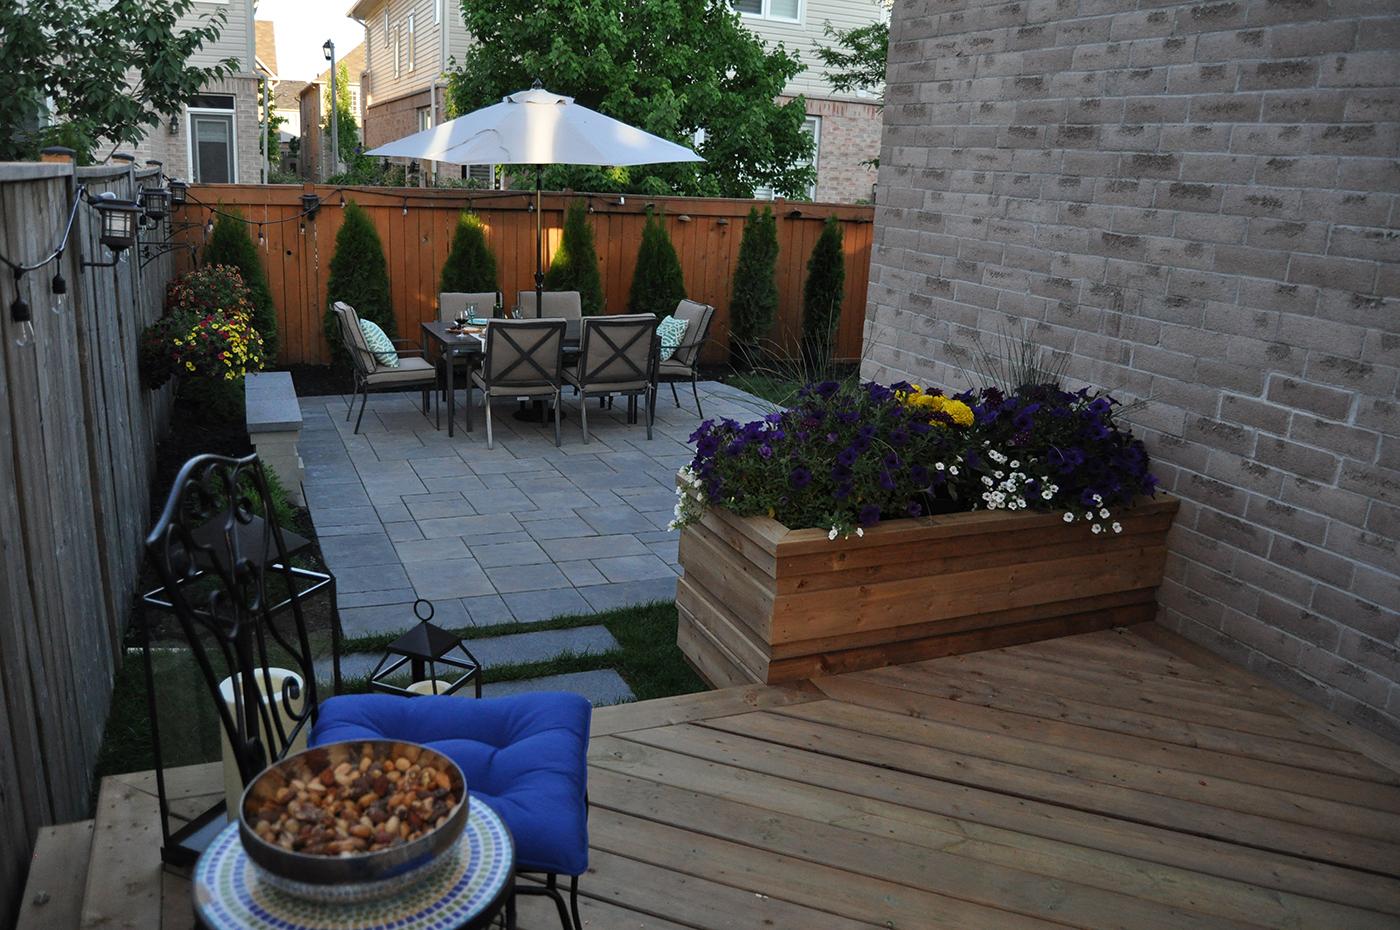 Unilock paver patio and deck